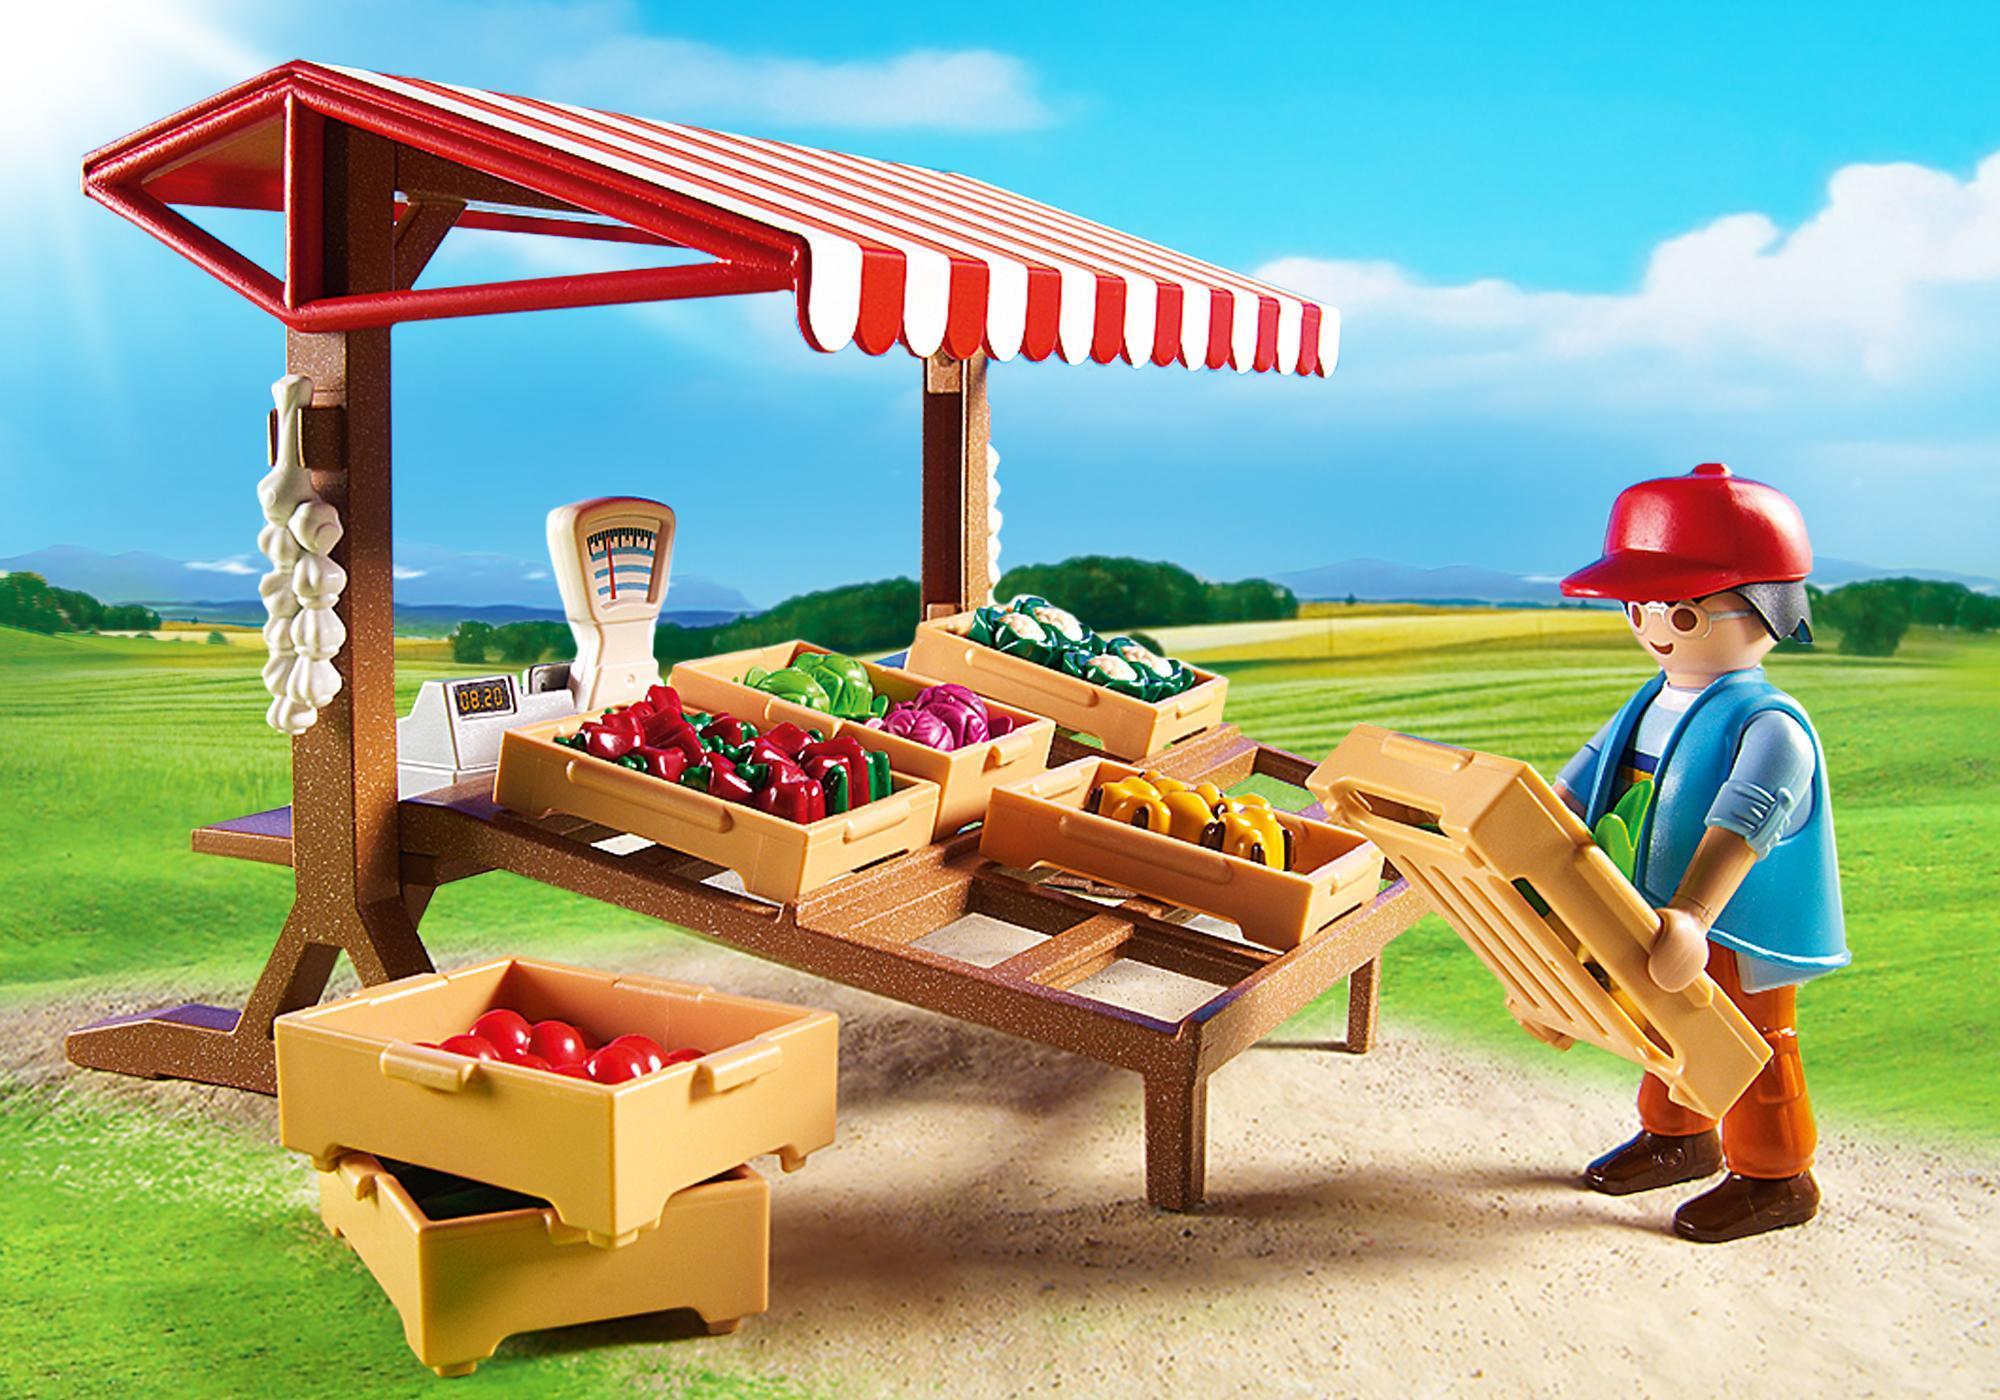 http://media.playmobil.com/i/playmobil/6121_product_extra2/Stragan z warzywami